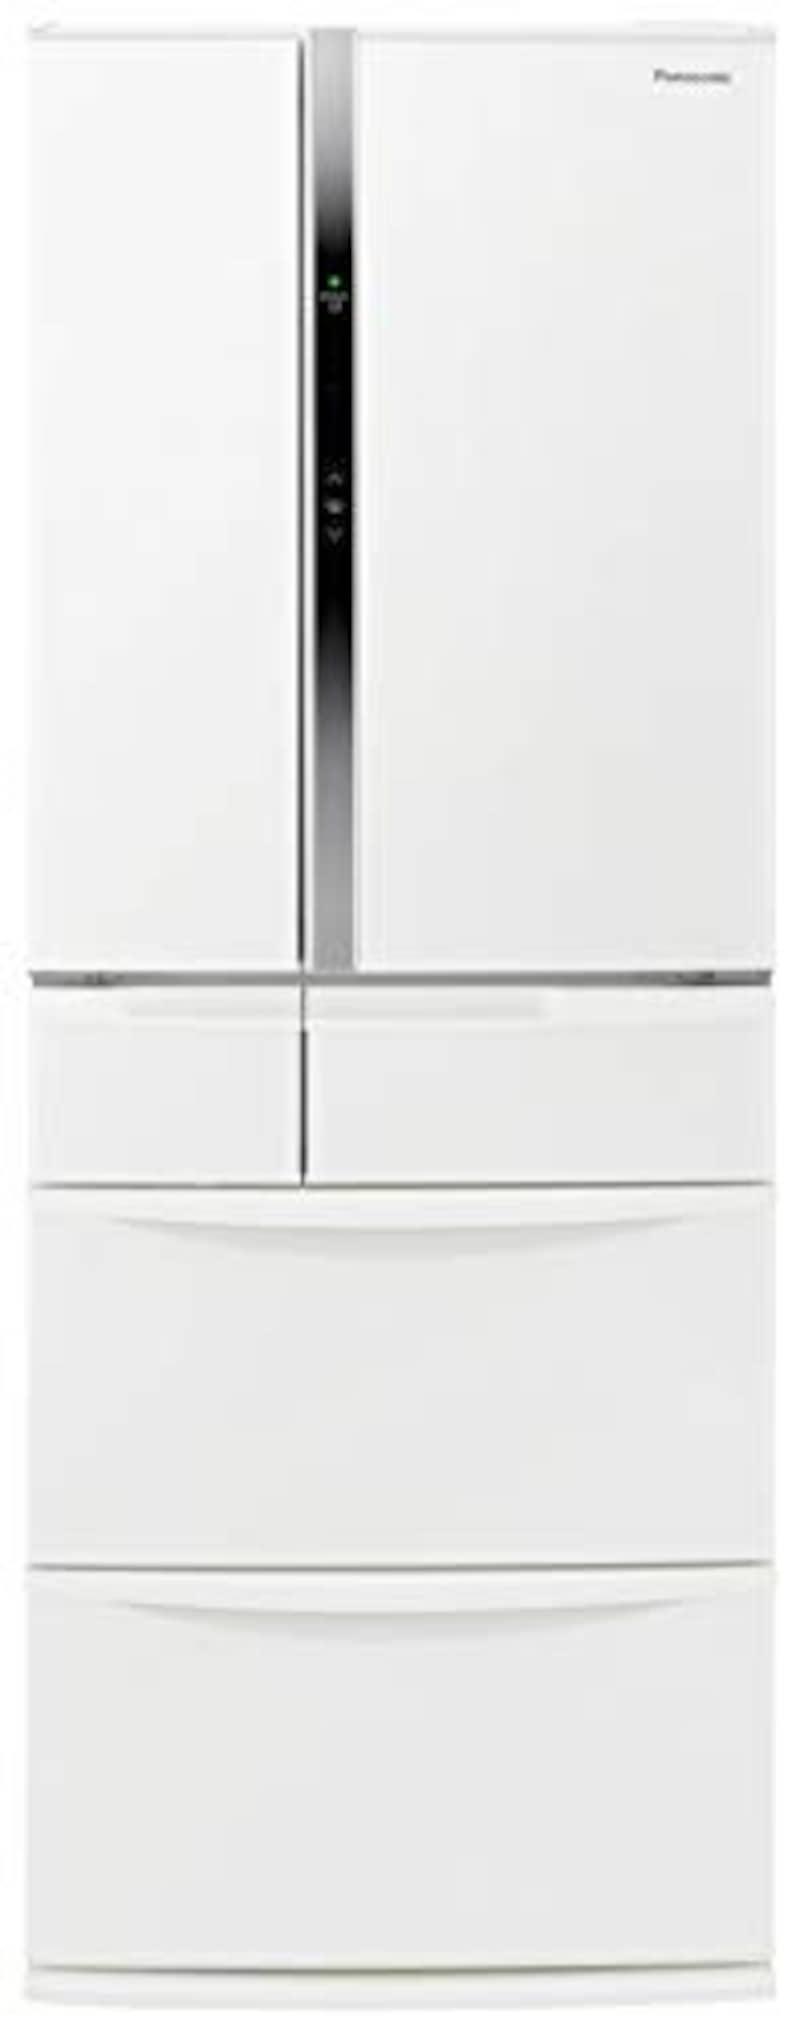 Panasonic(パナソニック),大容量冷蔵庫 FVFタイプ,NR-FVF456-W